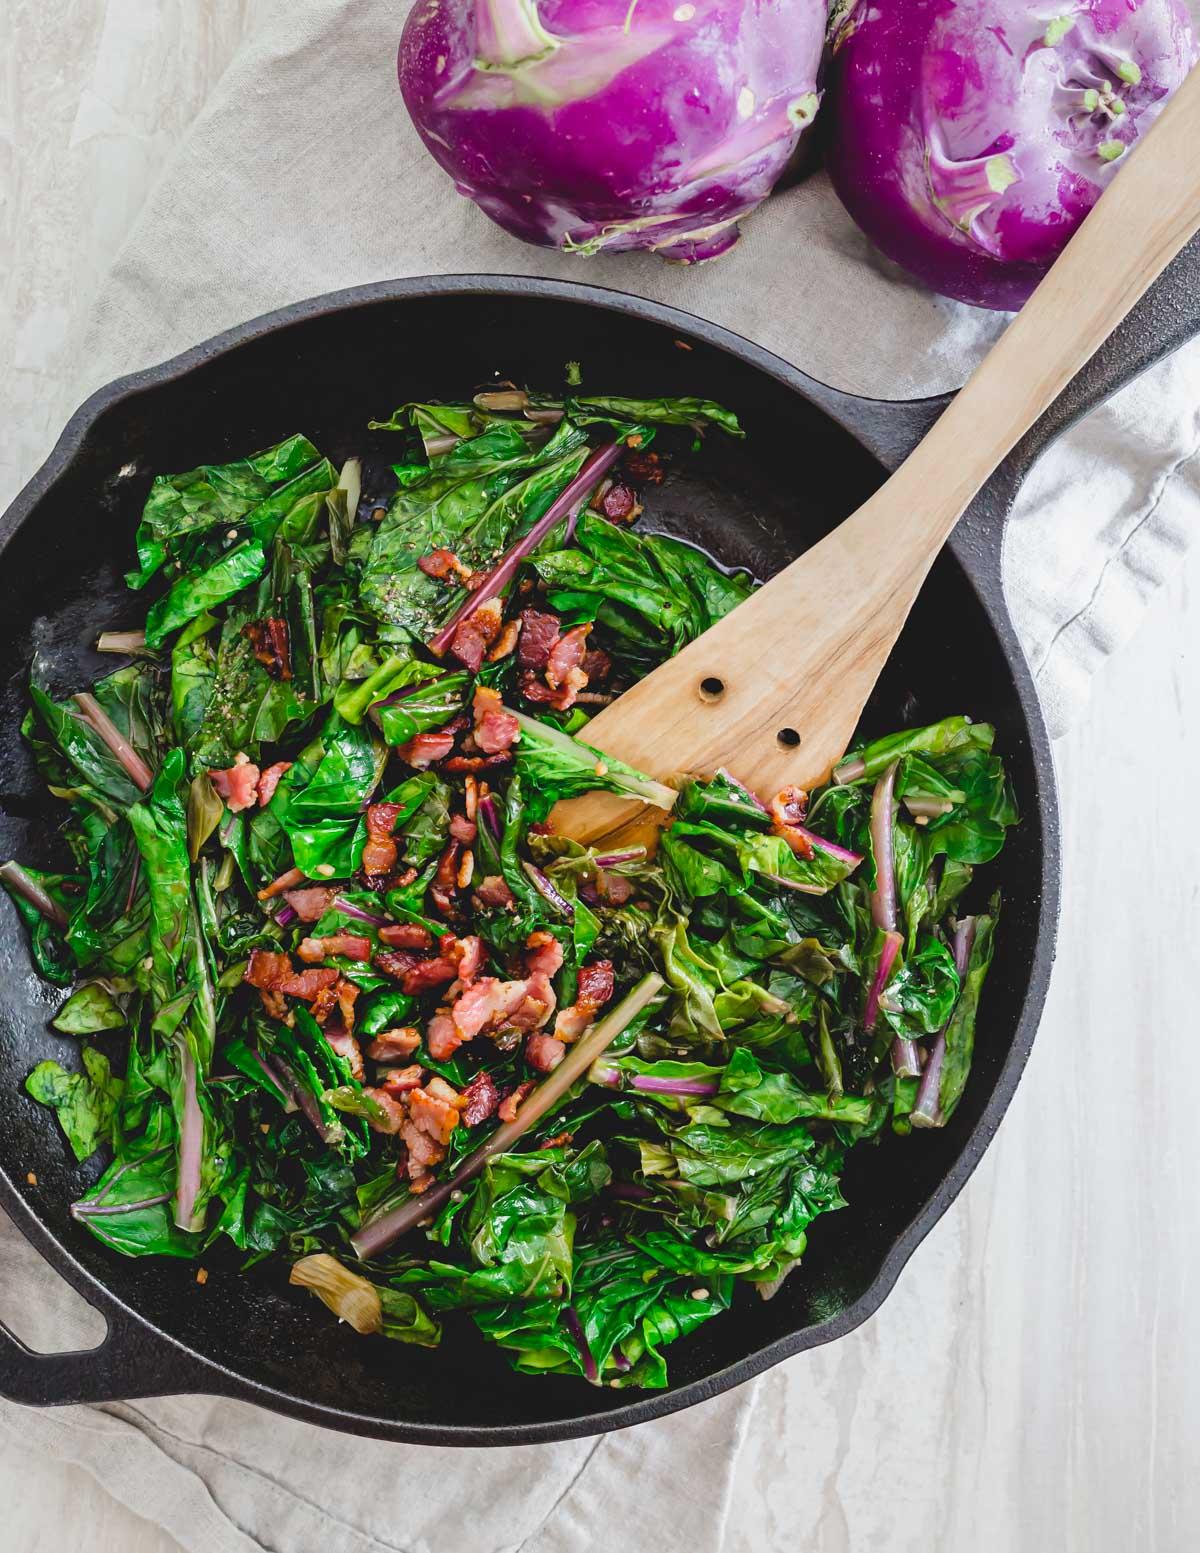 Sautéed kohlrabi greens in a skillet with crispy bacon.